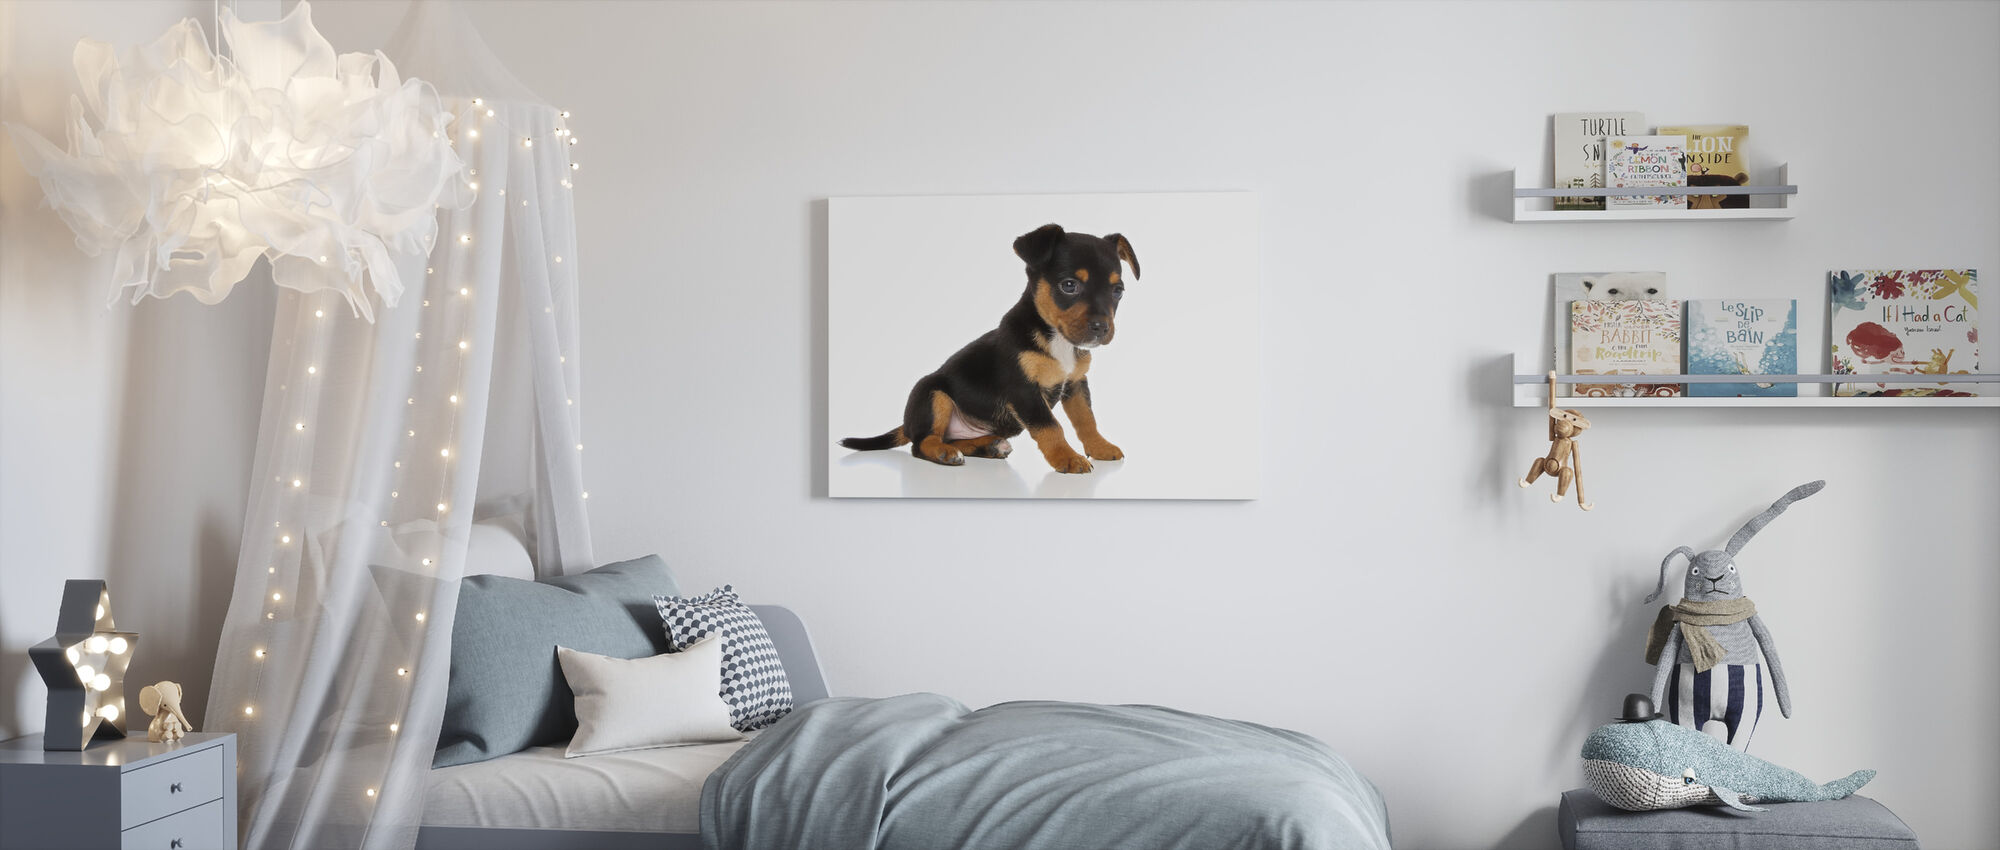 Cutest Puppy - Canvas print - Kids Room